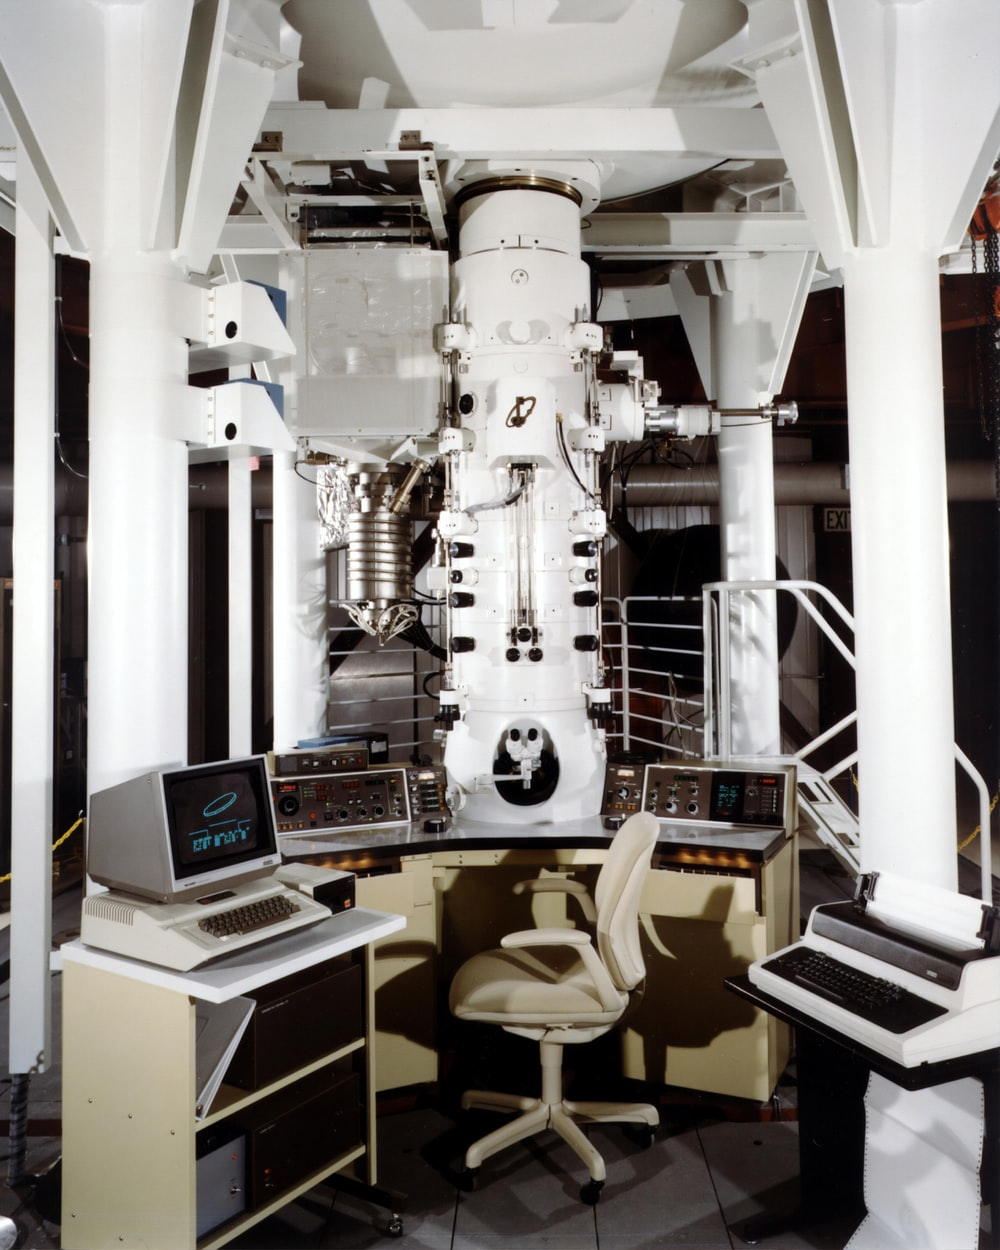 gray CRT computer monitor control panel table